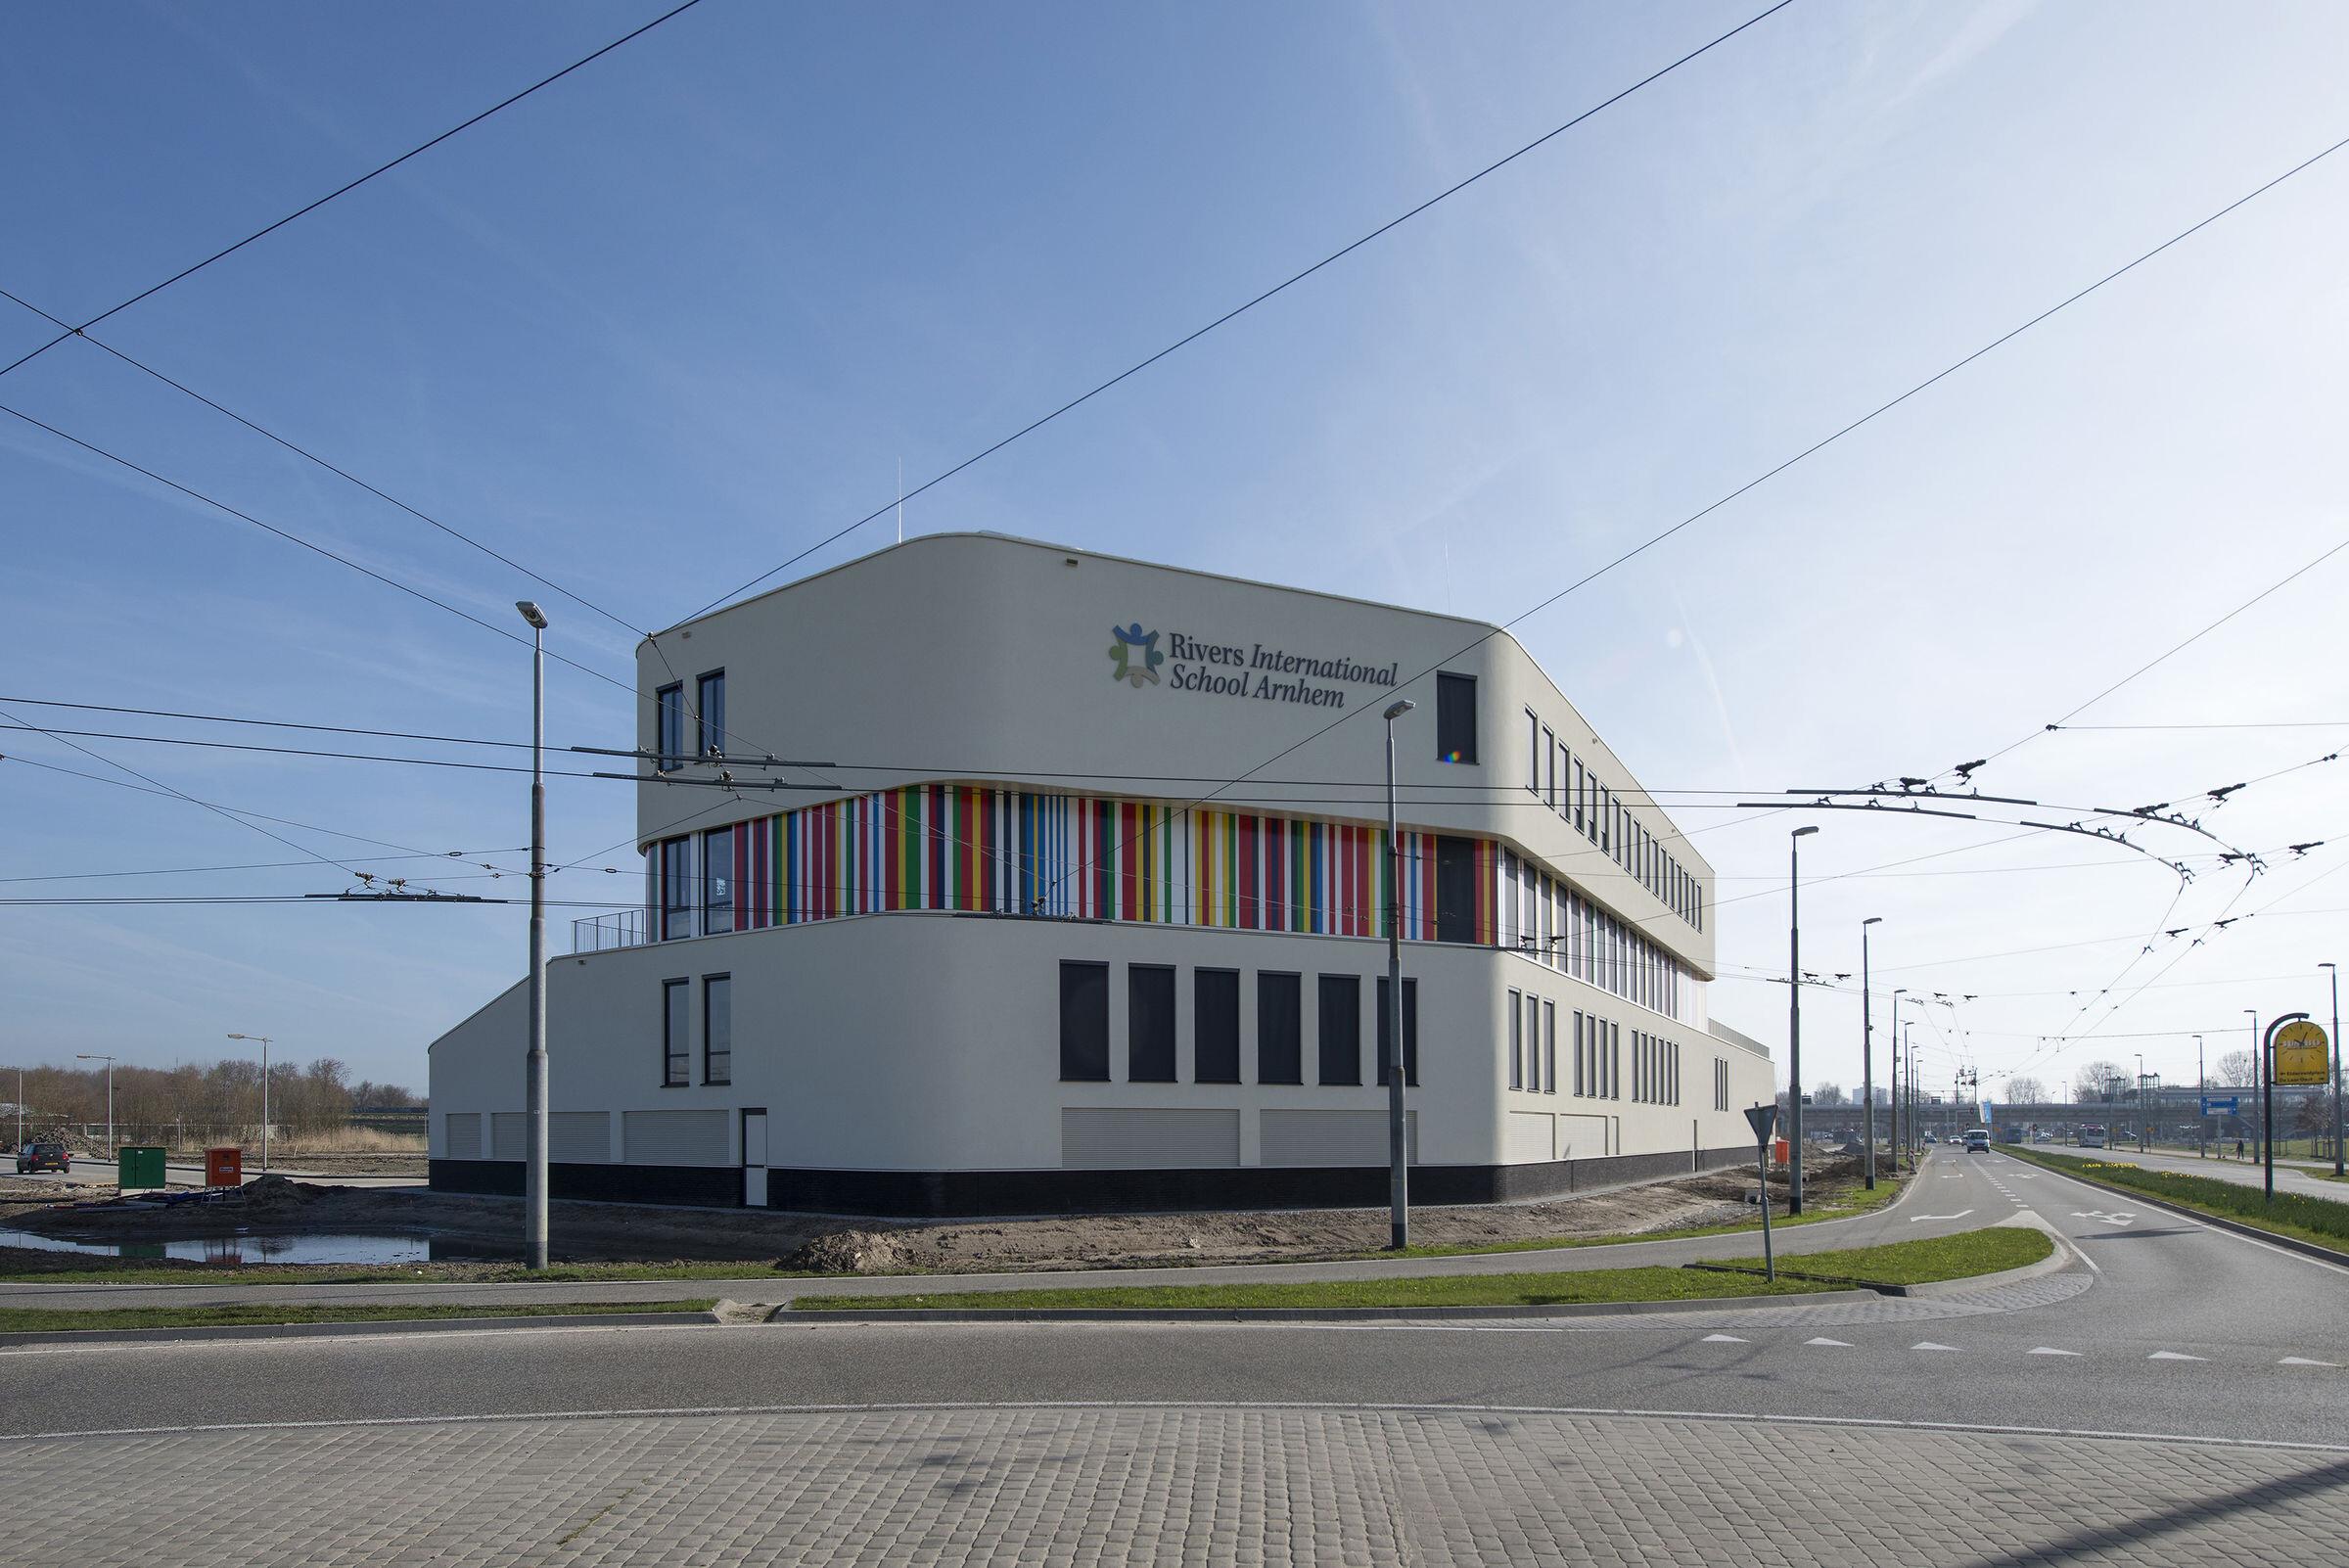 Rivers International School